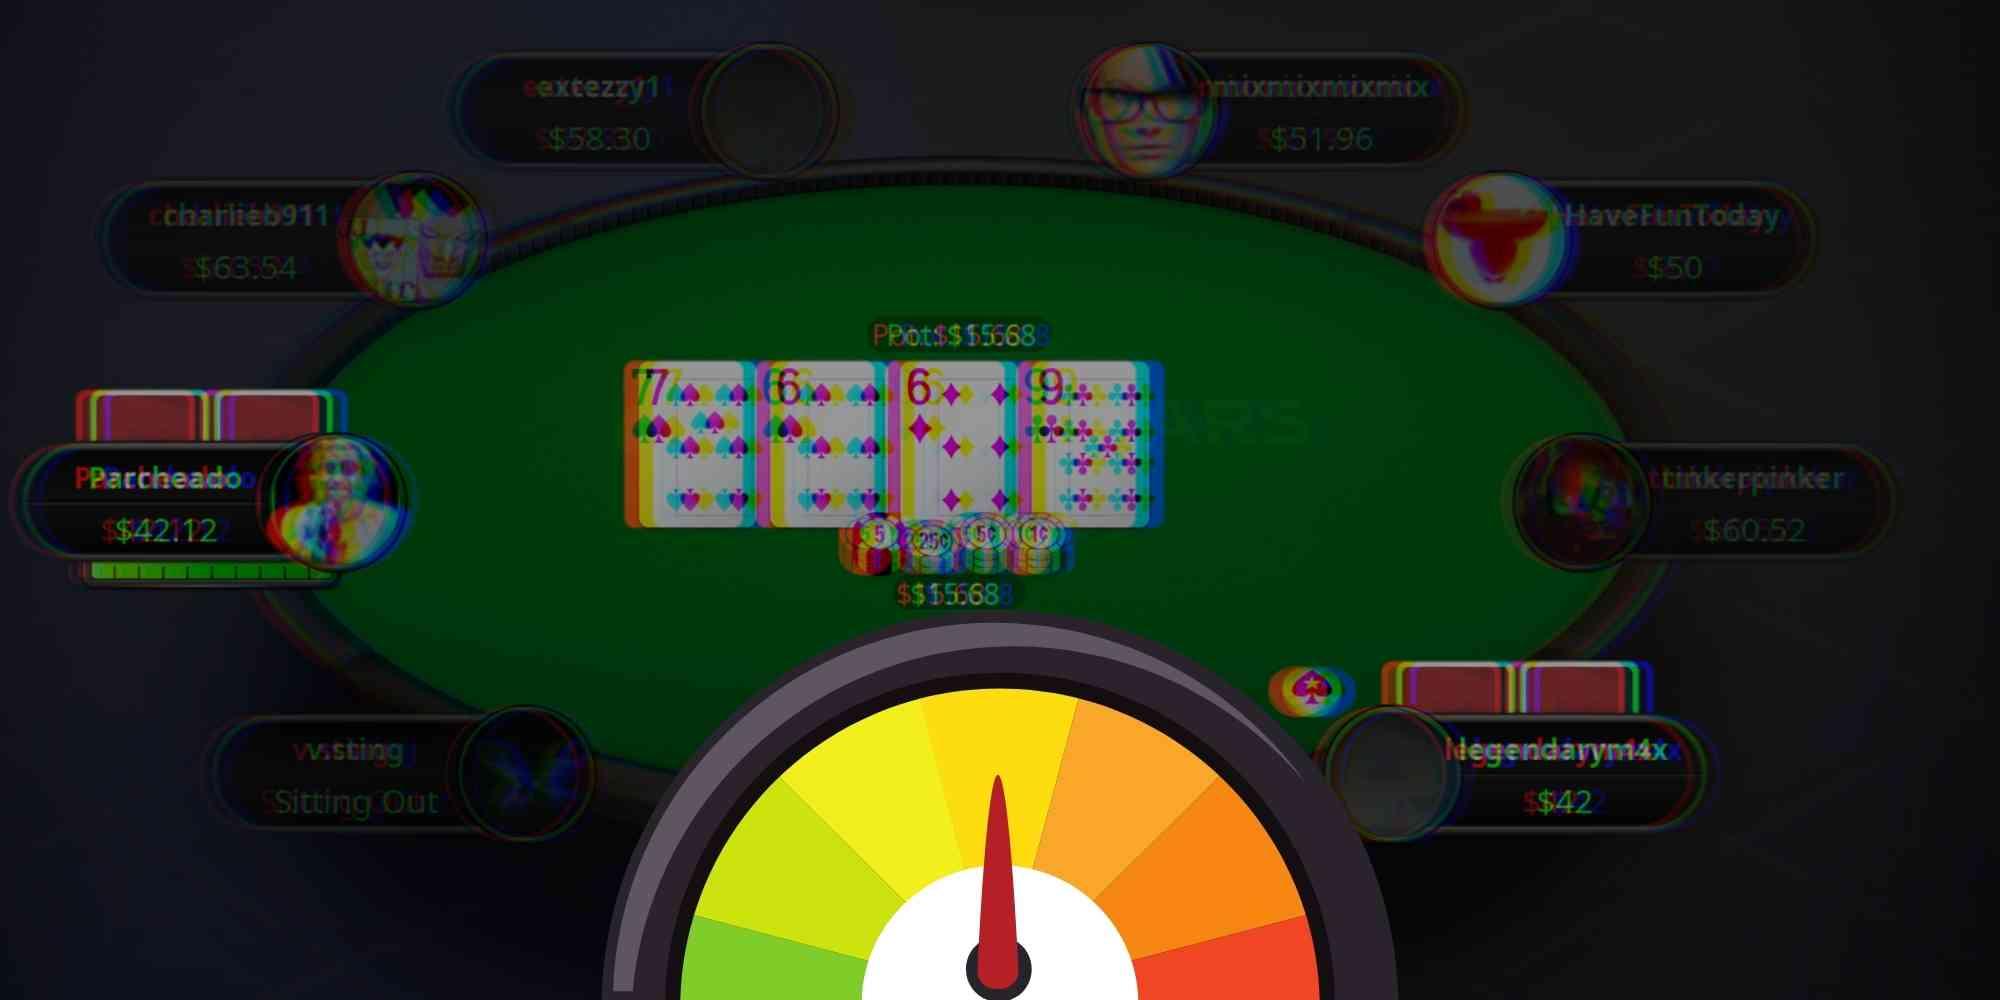 Average Hands Per Hour In Online Poker